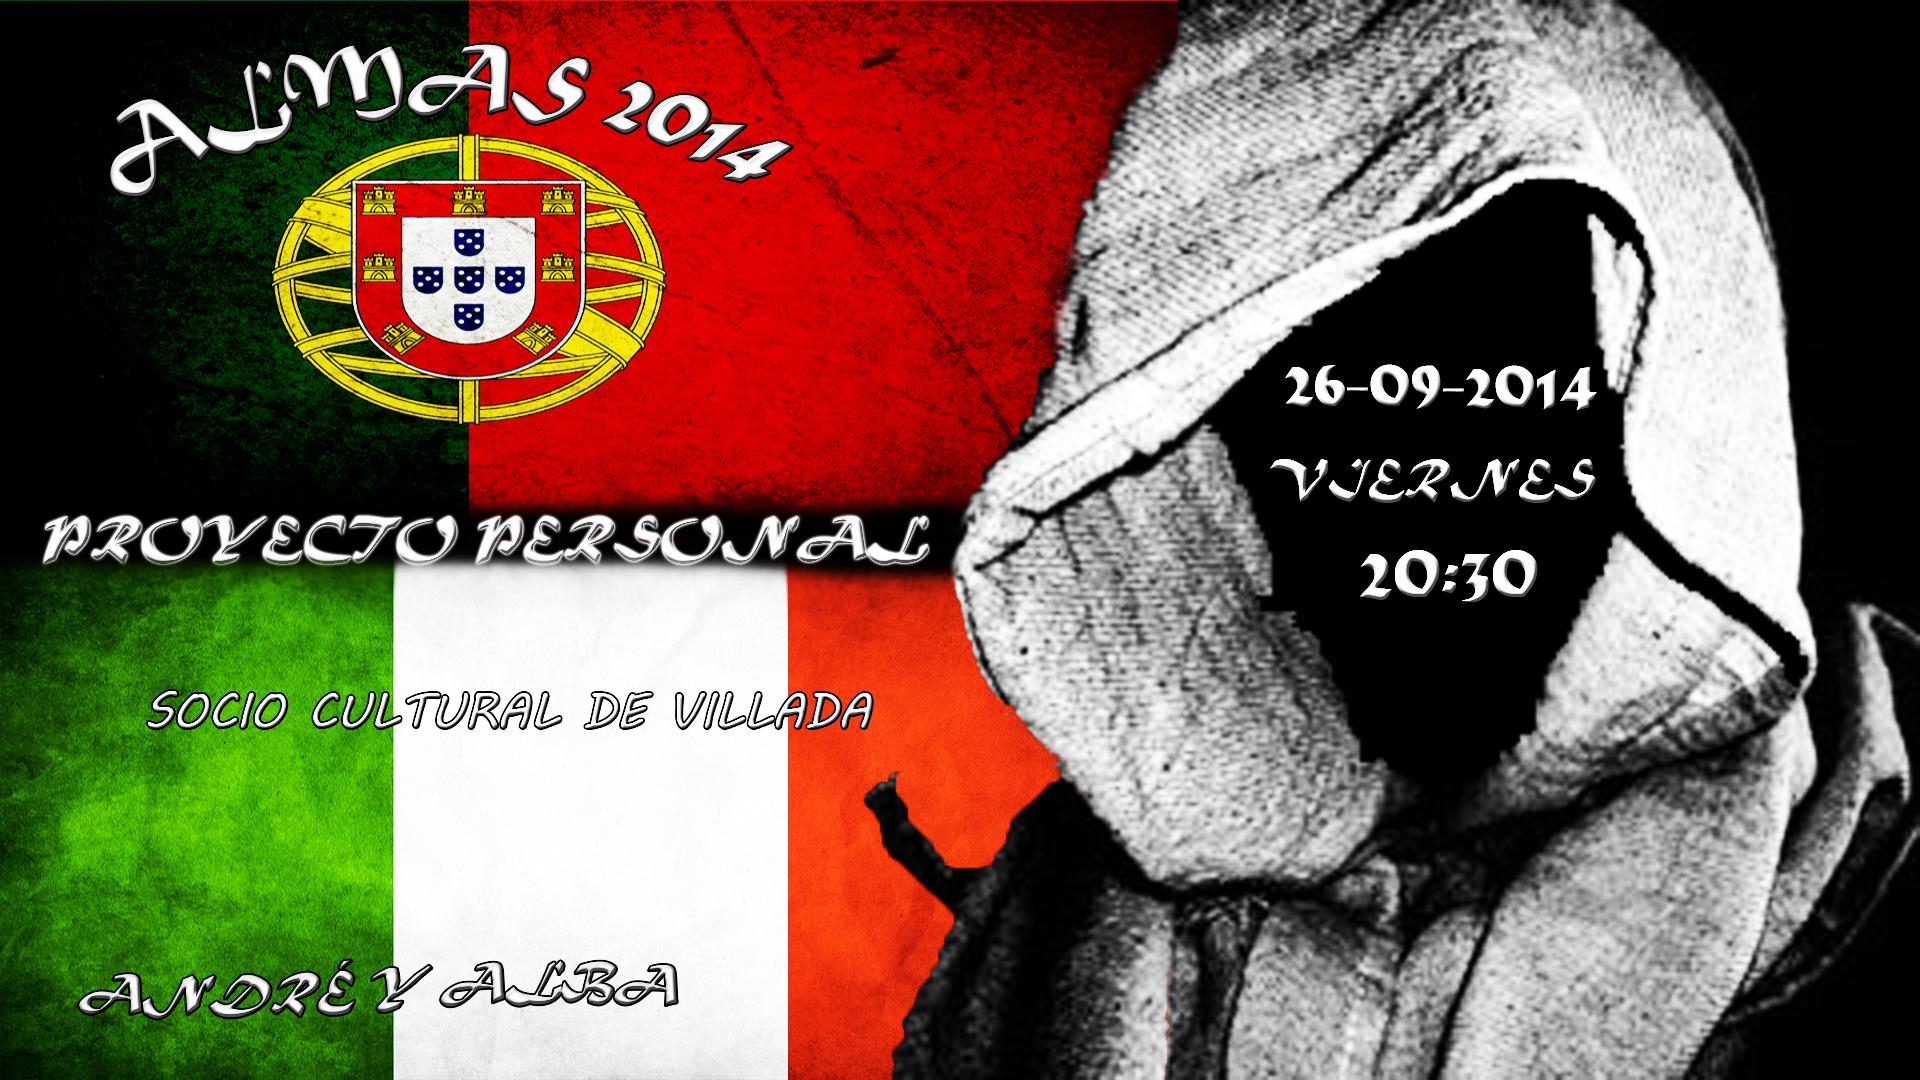 Festival ALMAS 2014